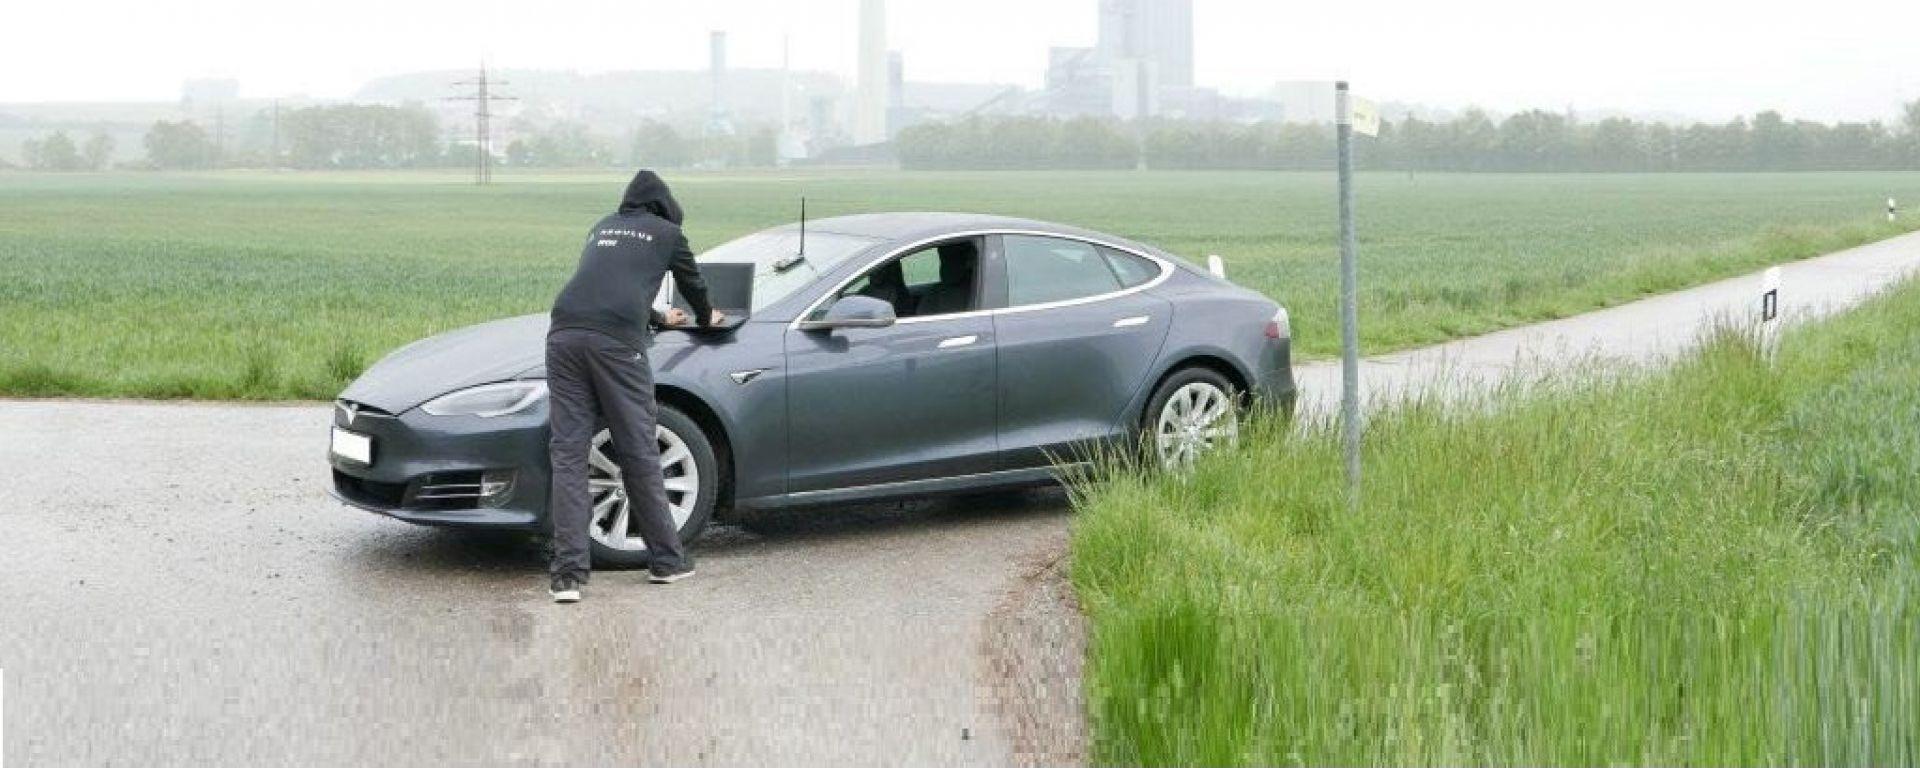 Tesla Model 3: il test di Regulus Cyber